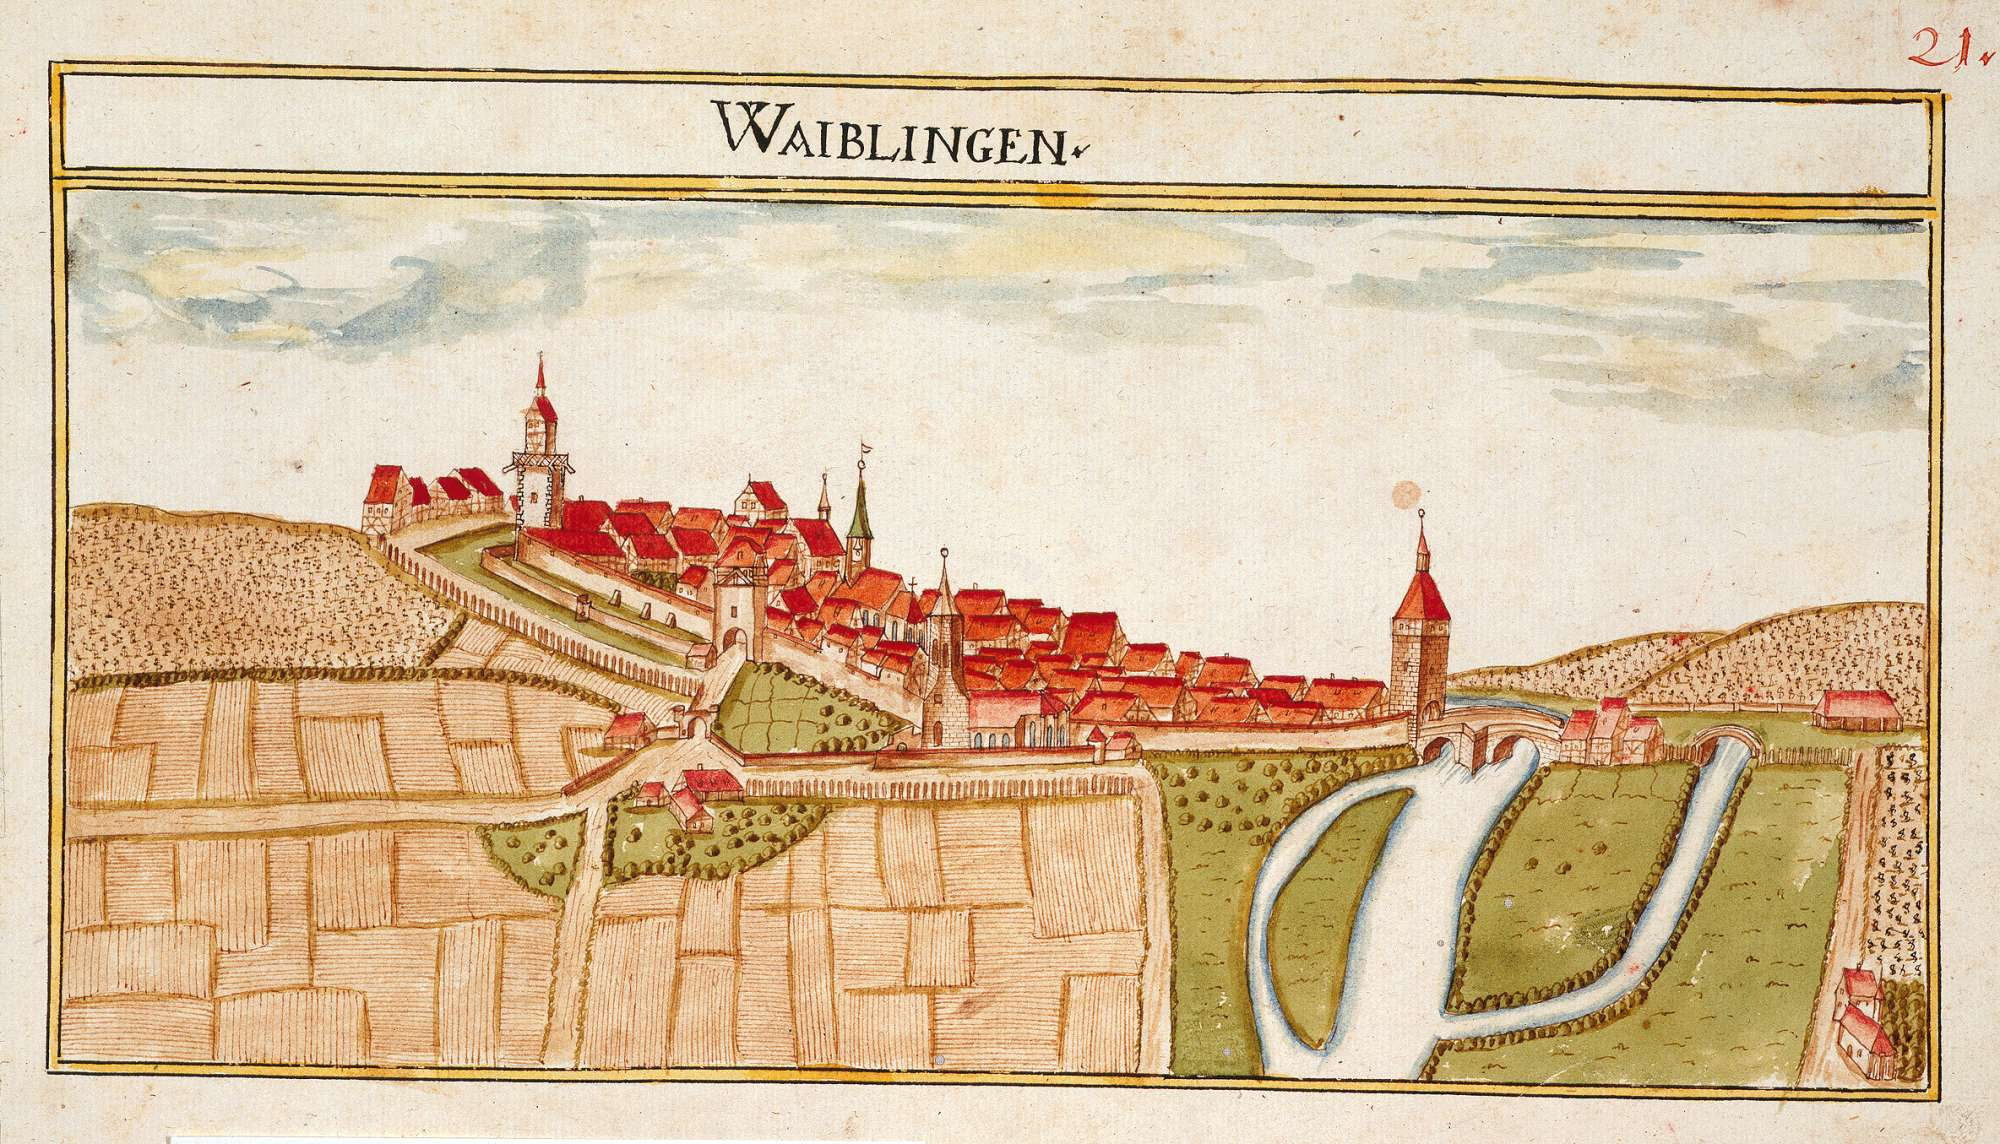 Waiblingen WN, Bild 1